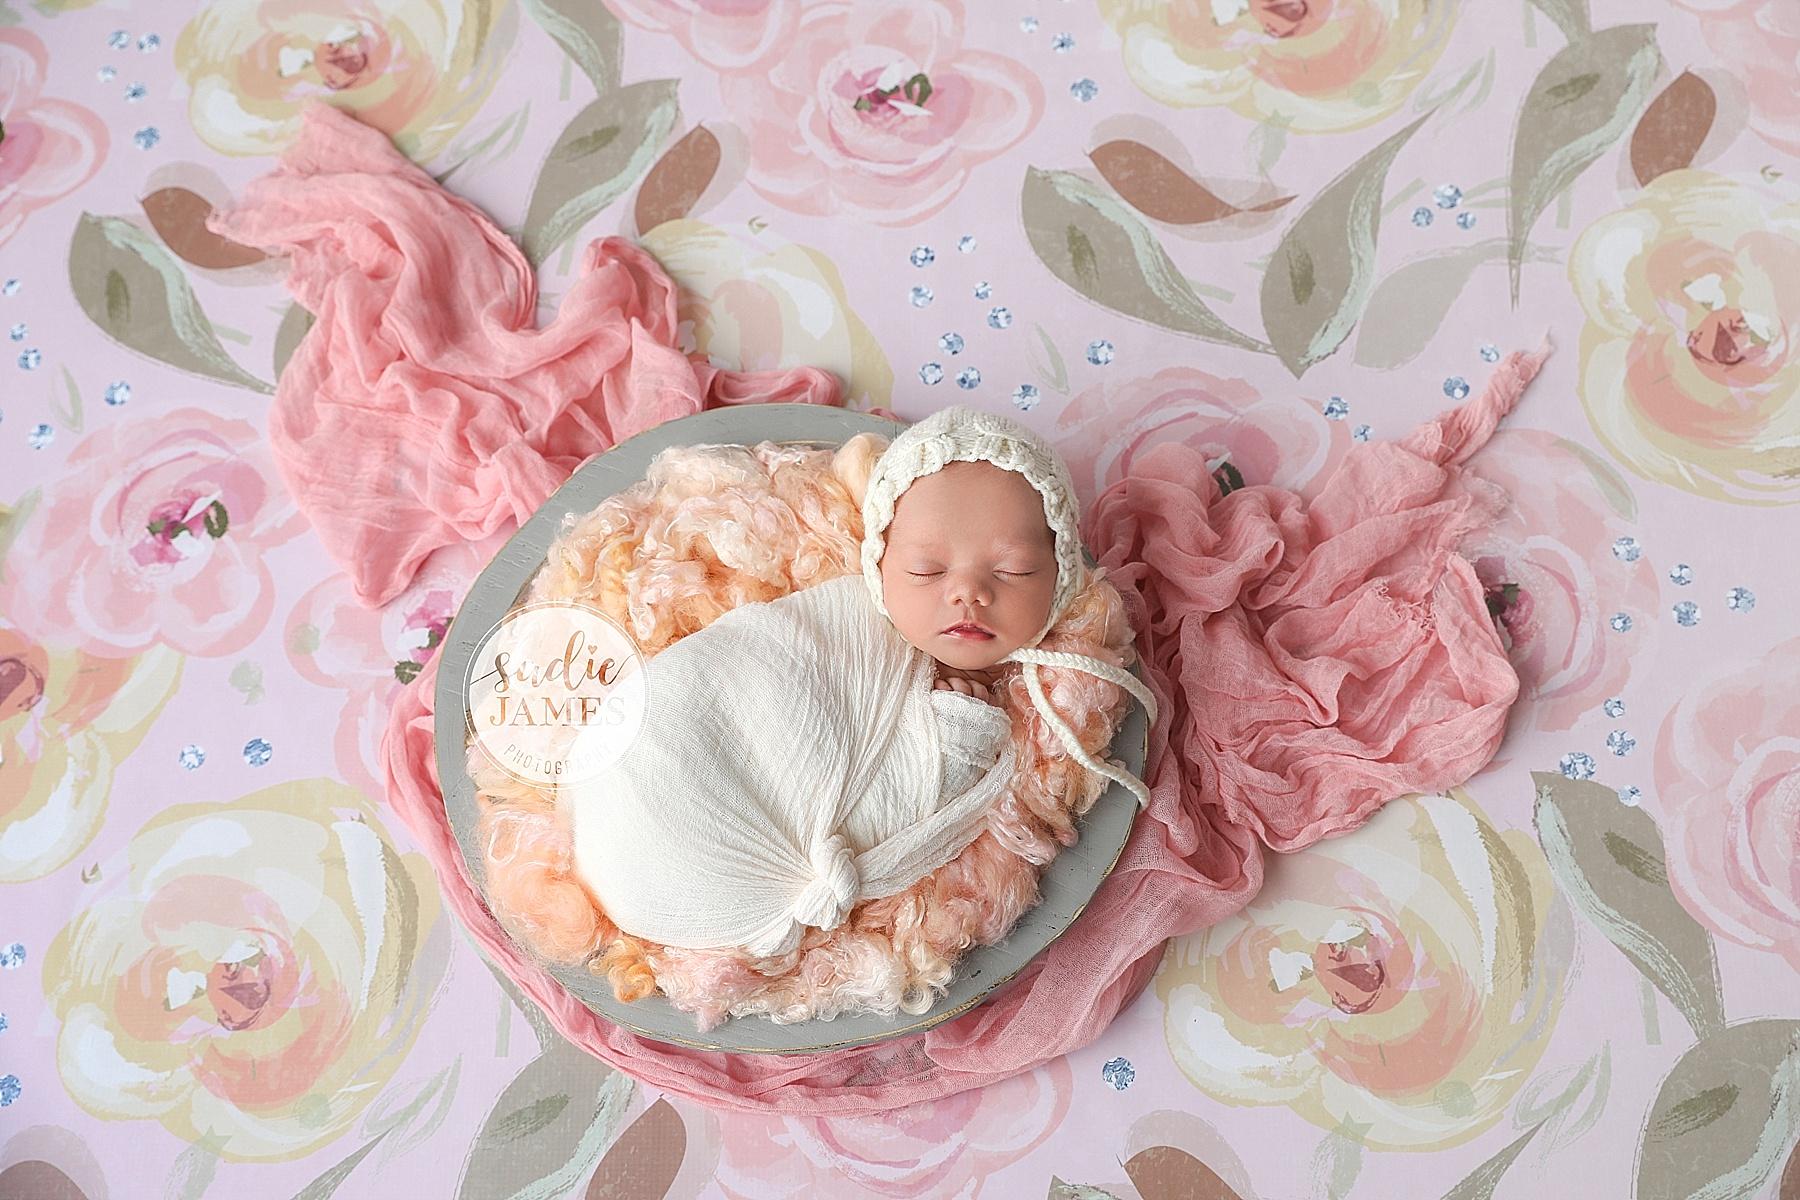 Sadie James Photography | California maternity photographer, CA newborn photographer, CA cake smash photographer, Orange County Children's photographer, baby's first year, milestones, baby plan, baby first year photography, newborn portraits, maternity portraits in Orange County